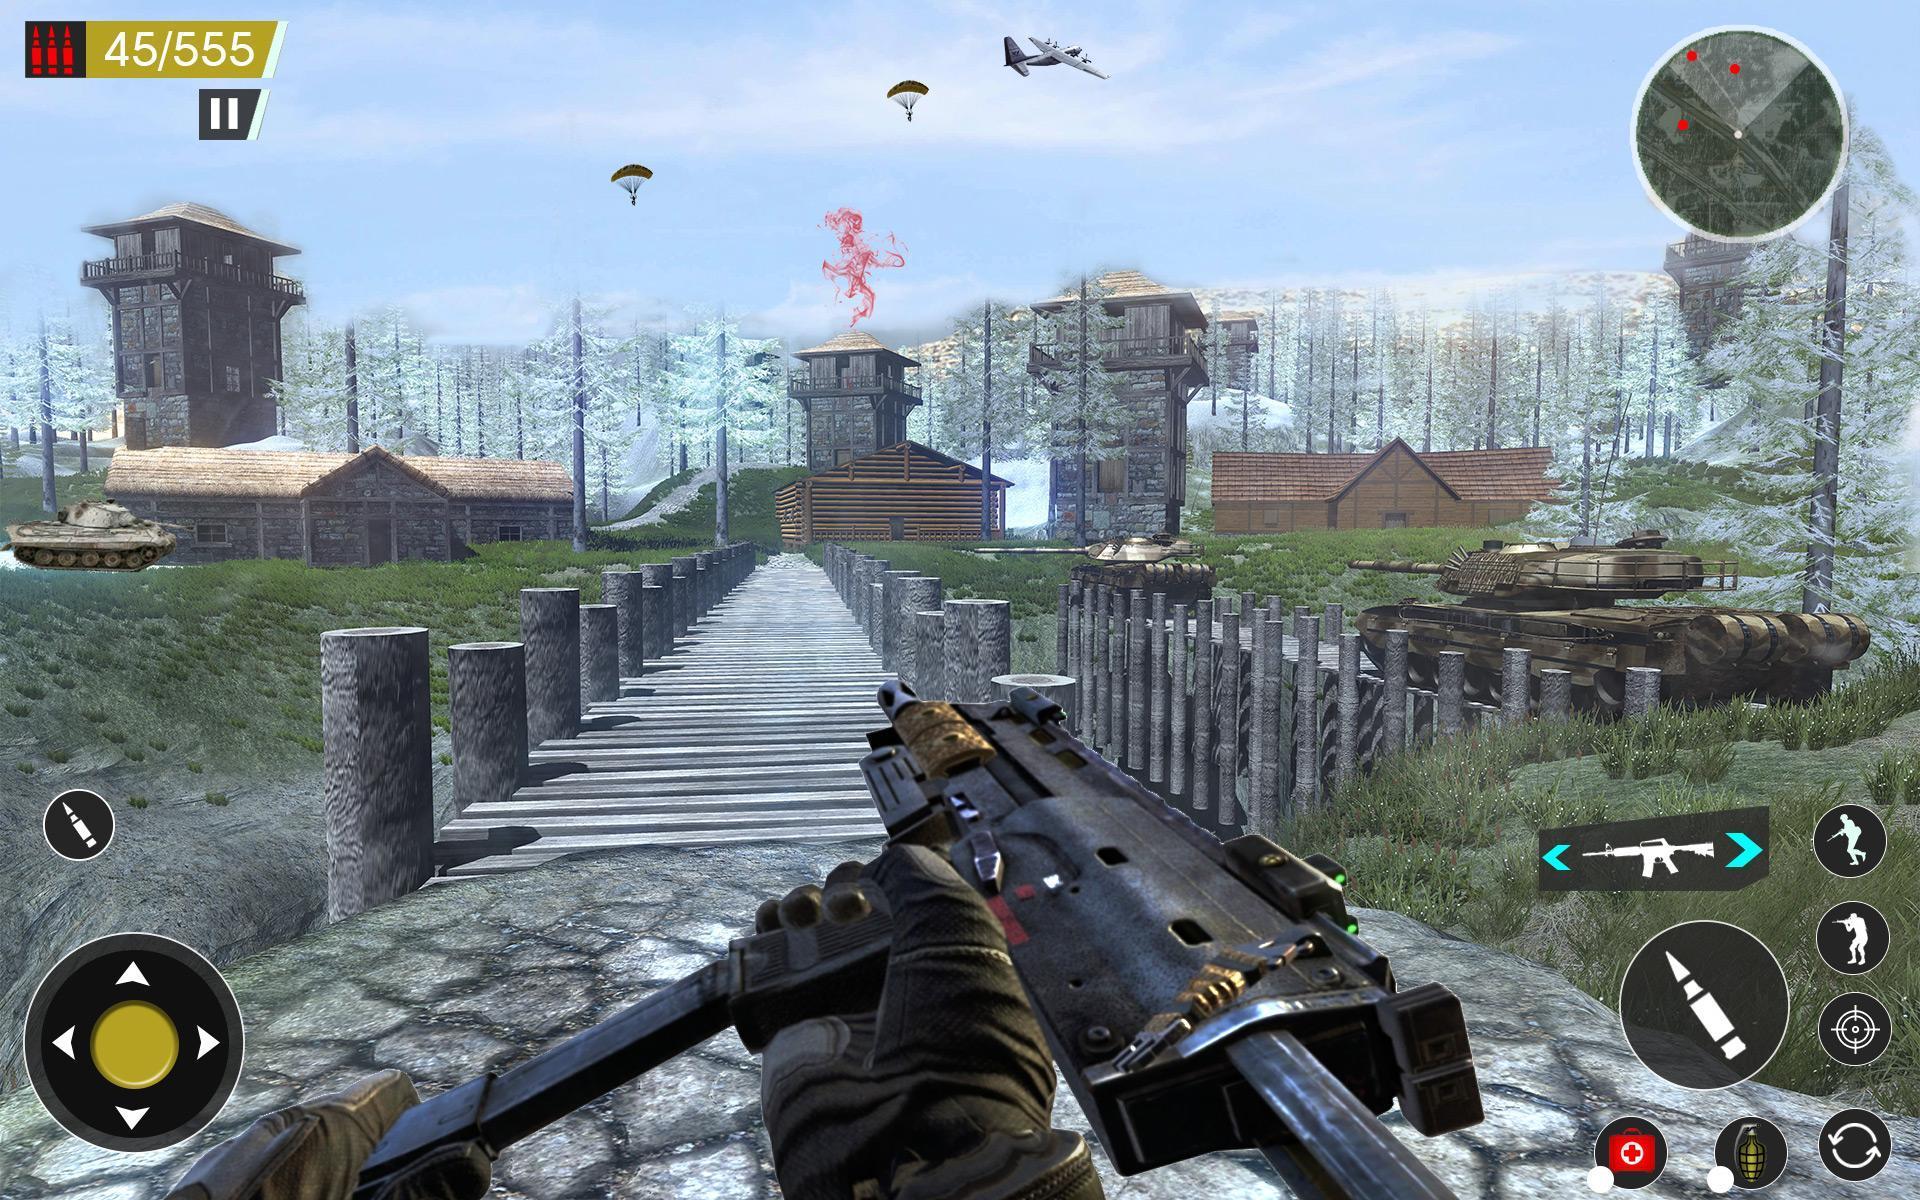 American World War Fps Shooter Free Shooting Games 4.8 Screenshot 3